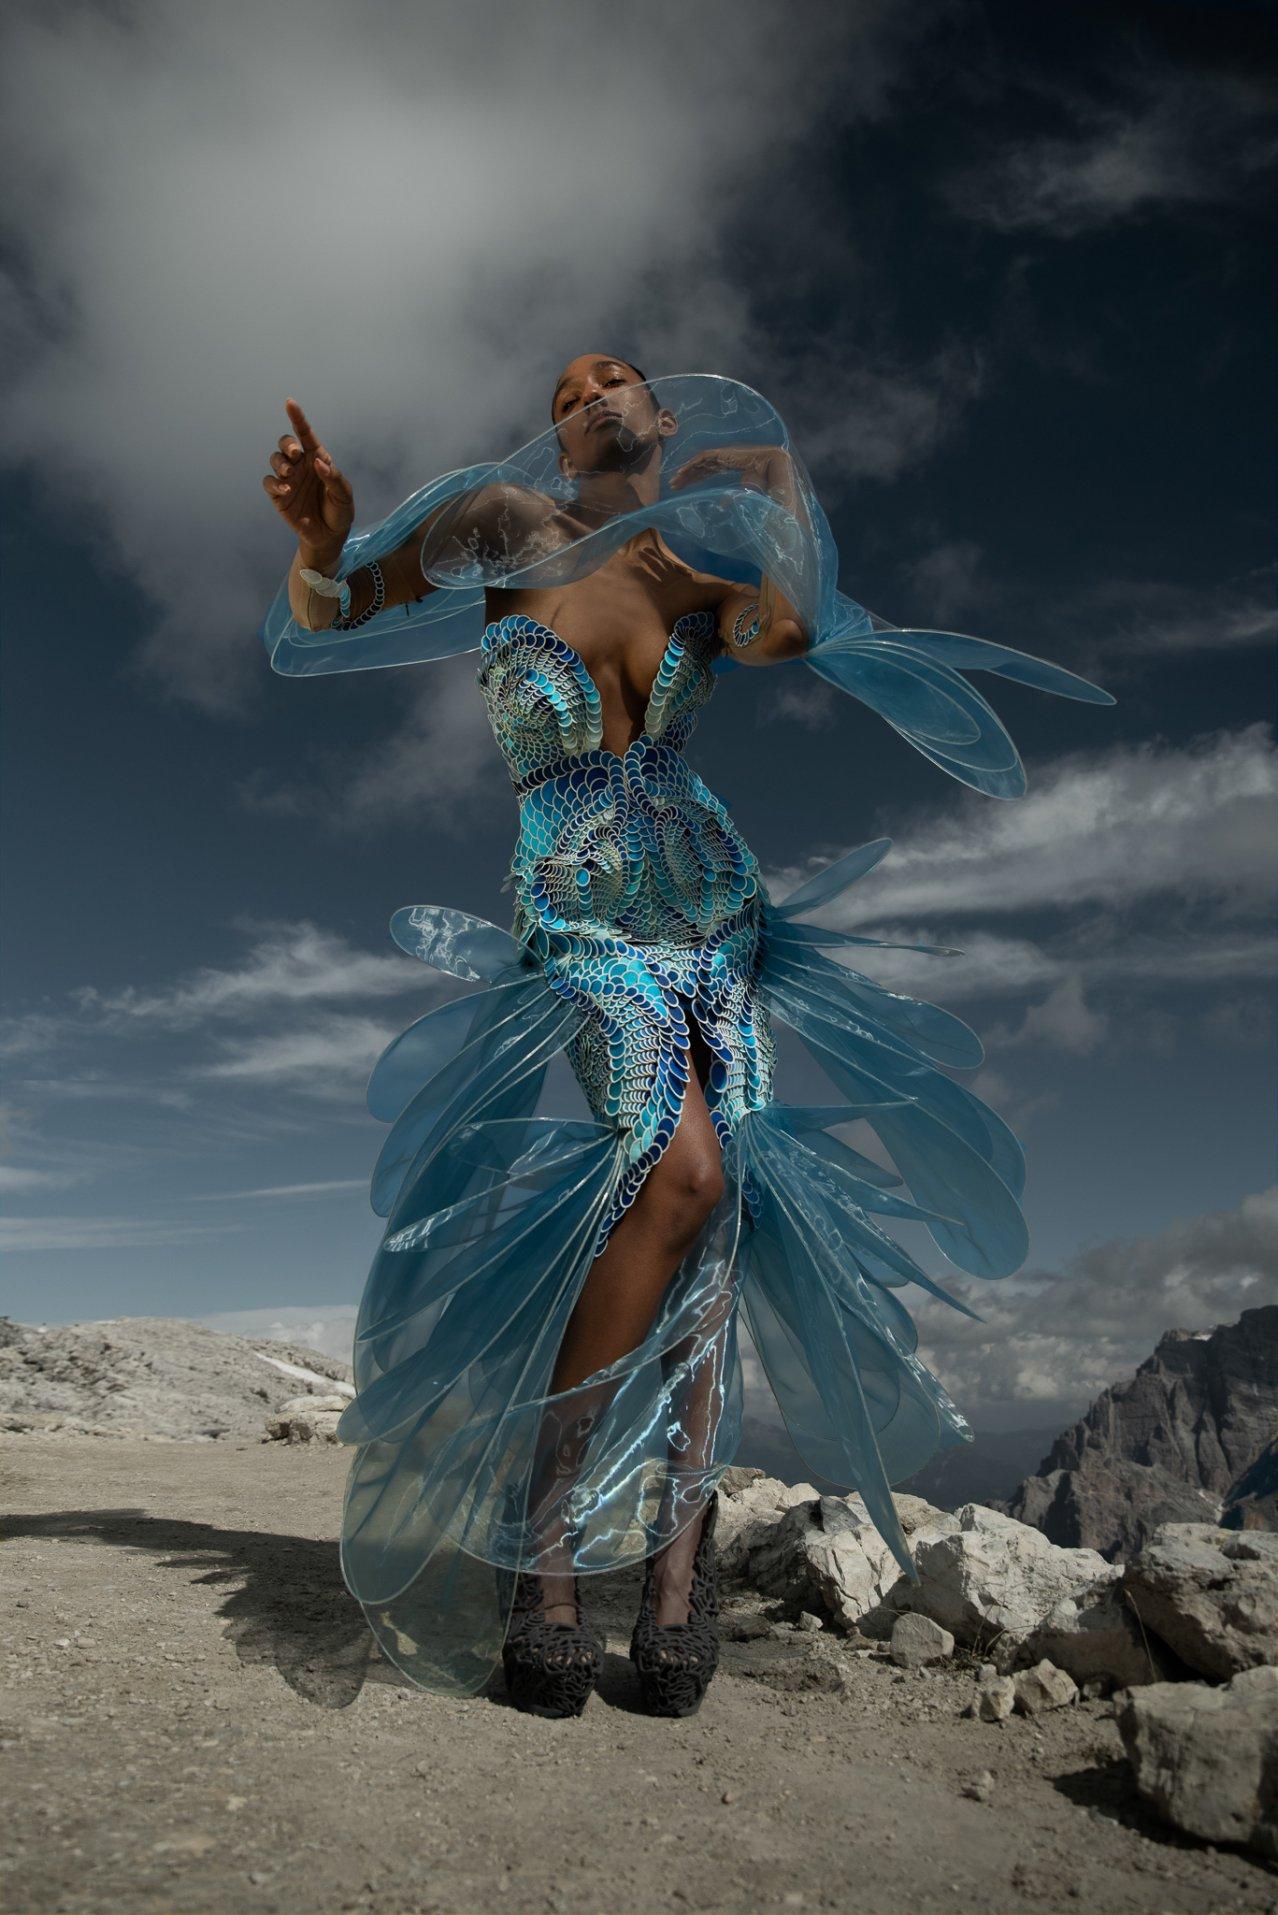 Iris-van-Herpen-AW21_22-Earthrise-Photography-by-Siermond-Nicholas-Fols-XIII